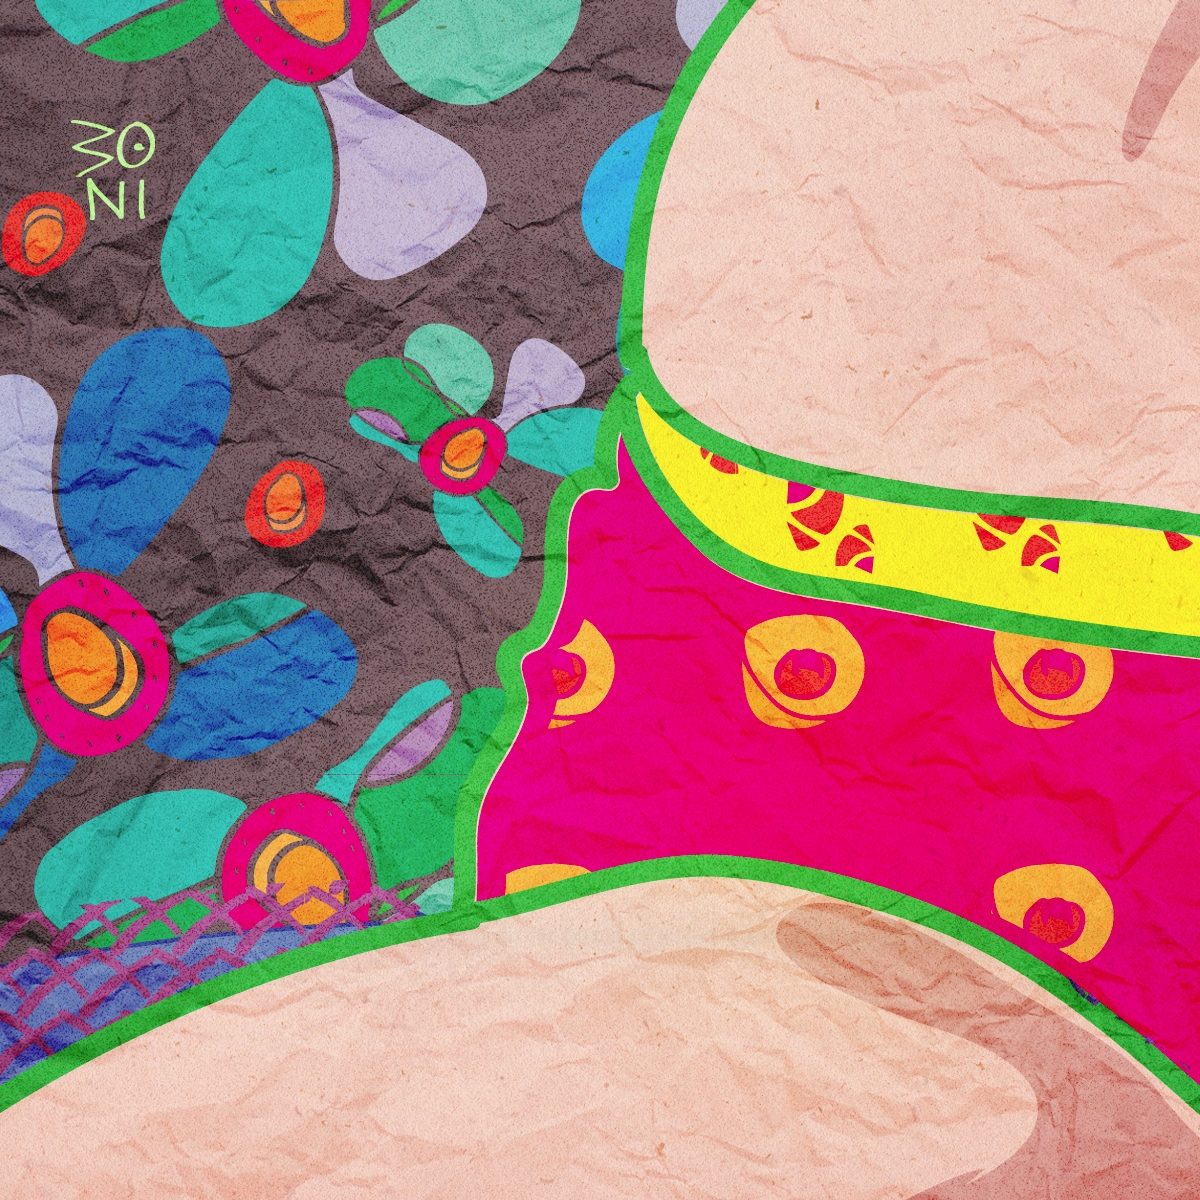 BONI art&design (@boniartdesign) Cover Image